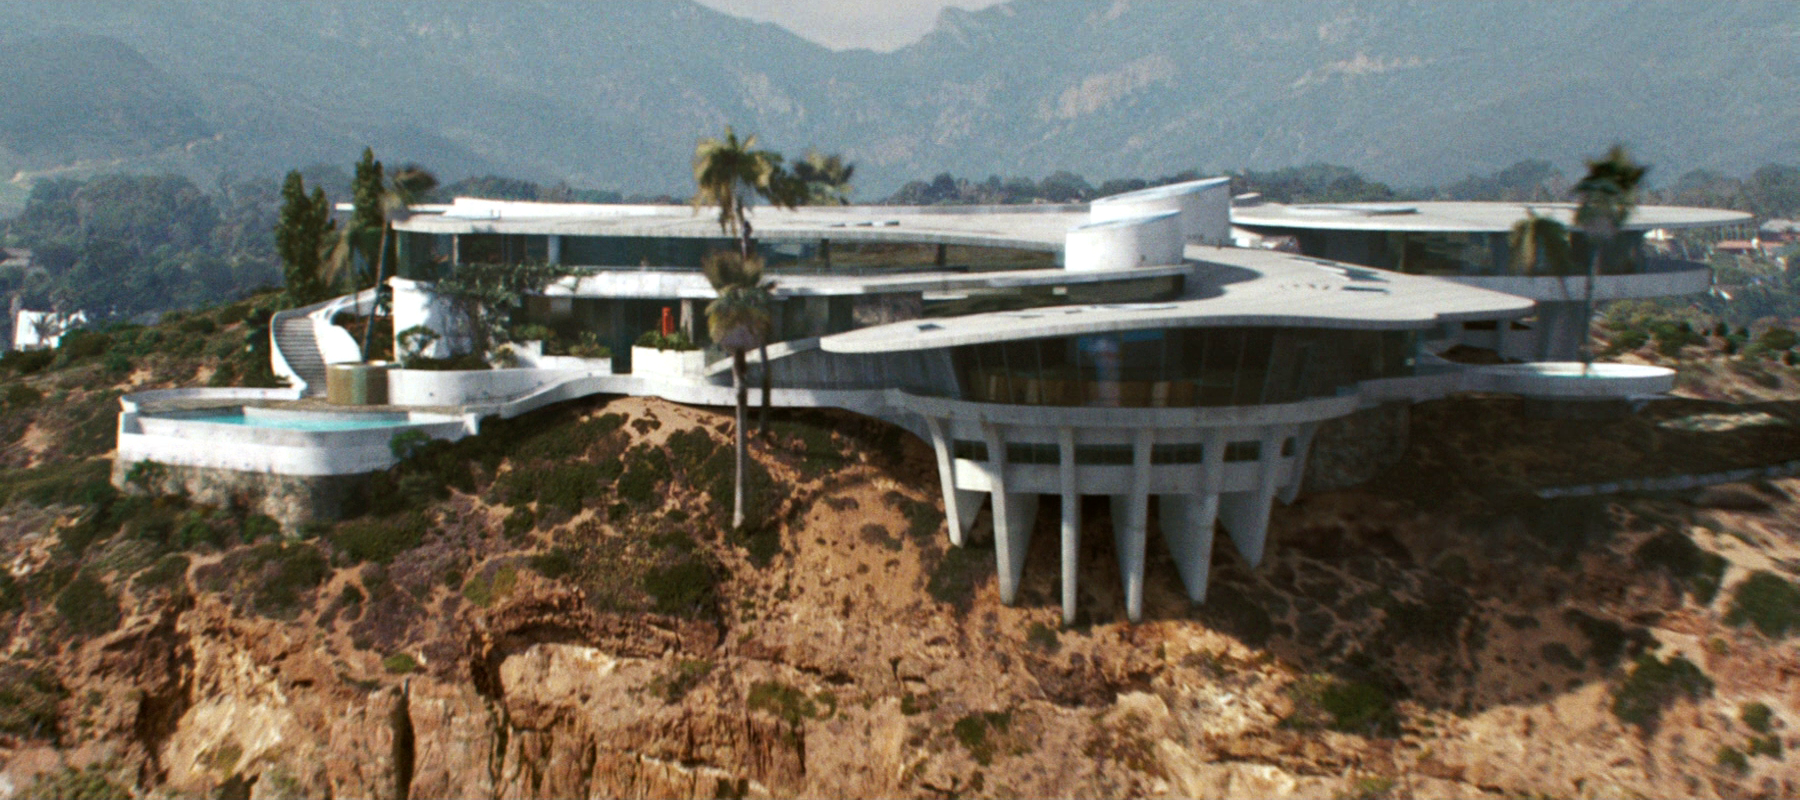 Tony Stark's Mansion - Marvel Cinematic Universe Wiki